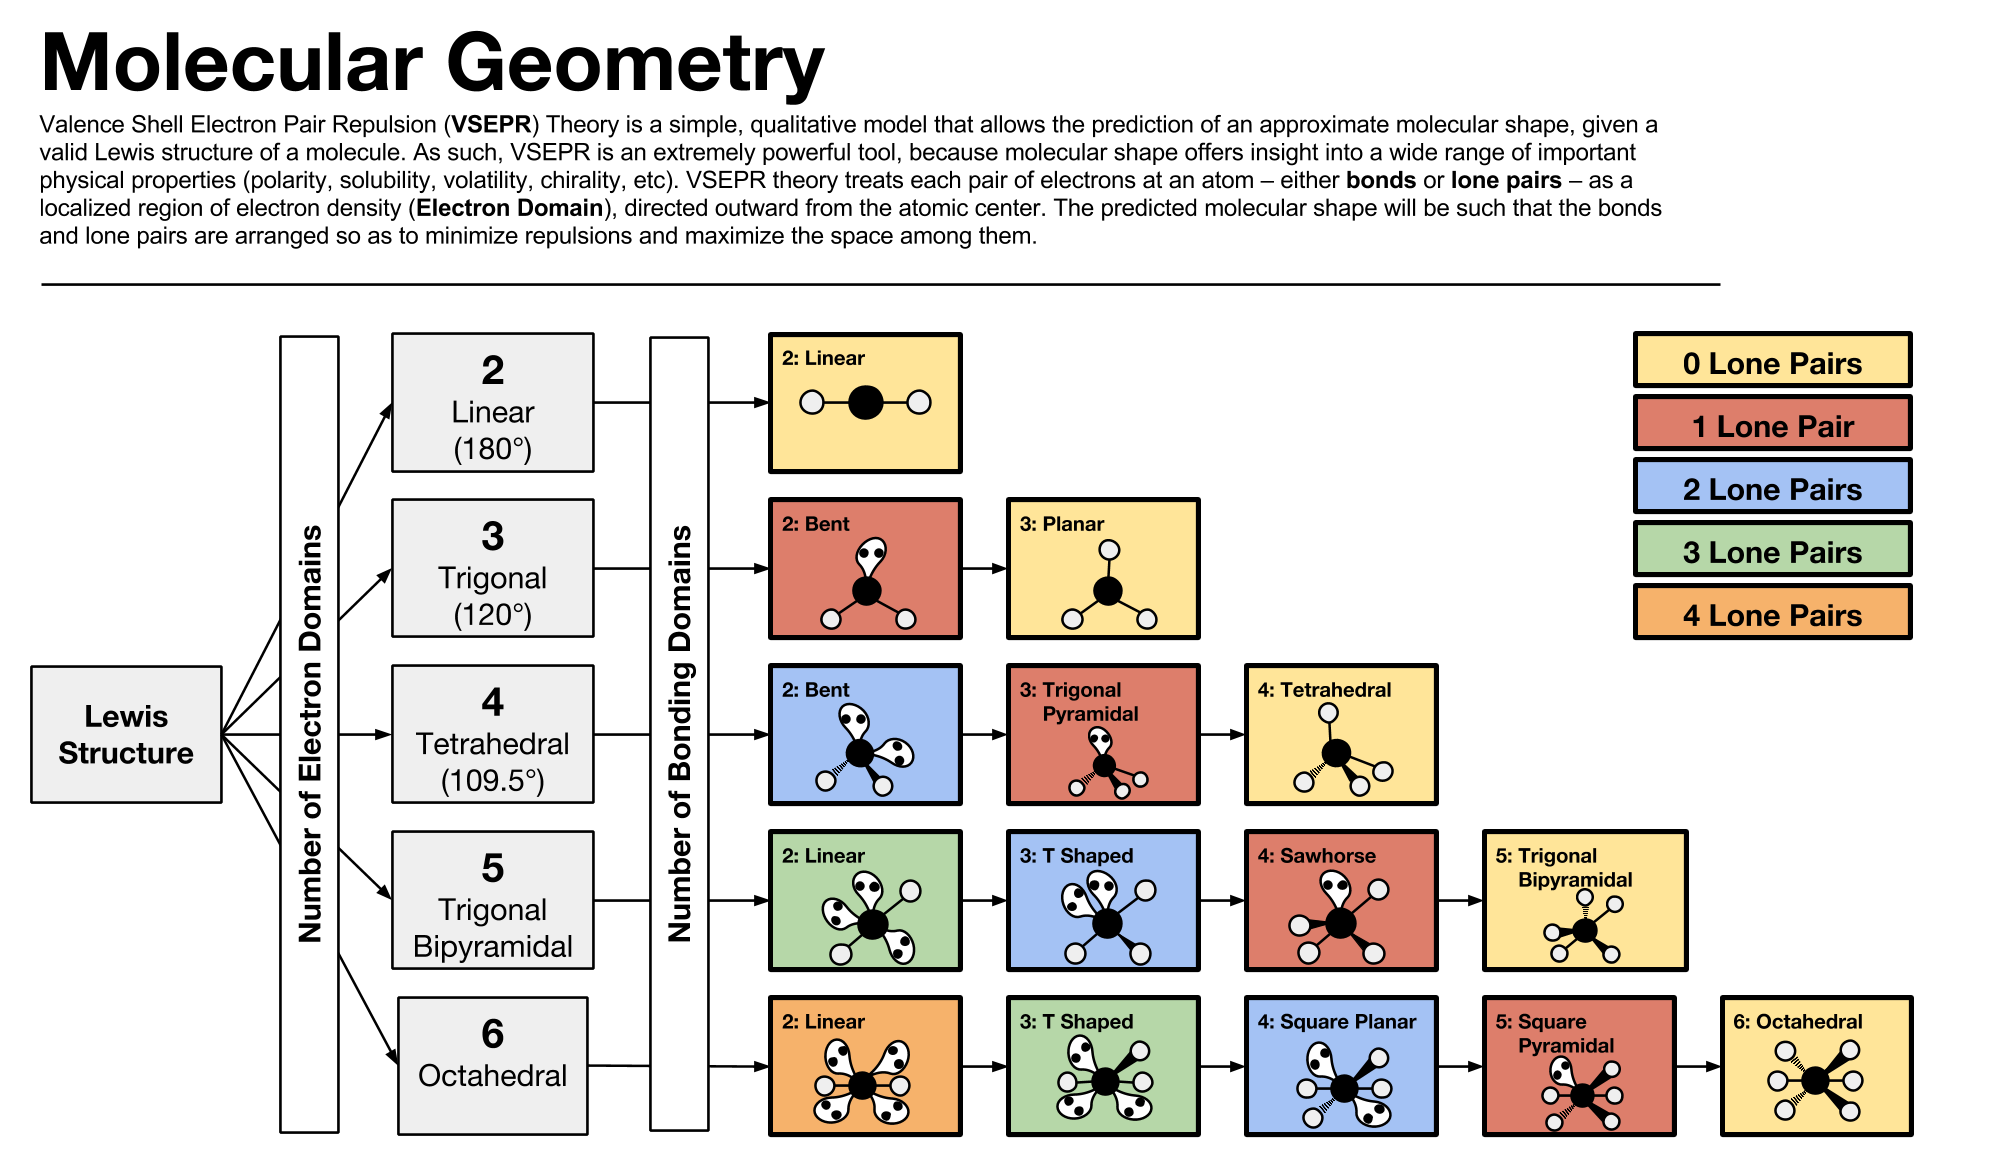 Pin by Neelam Singh on Molecular shapes | Pinterest | Molecular ...